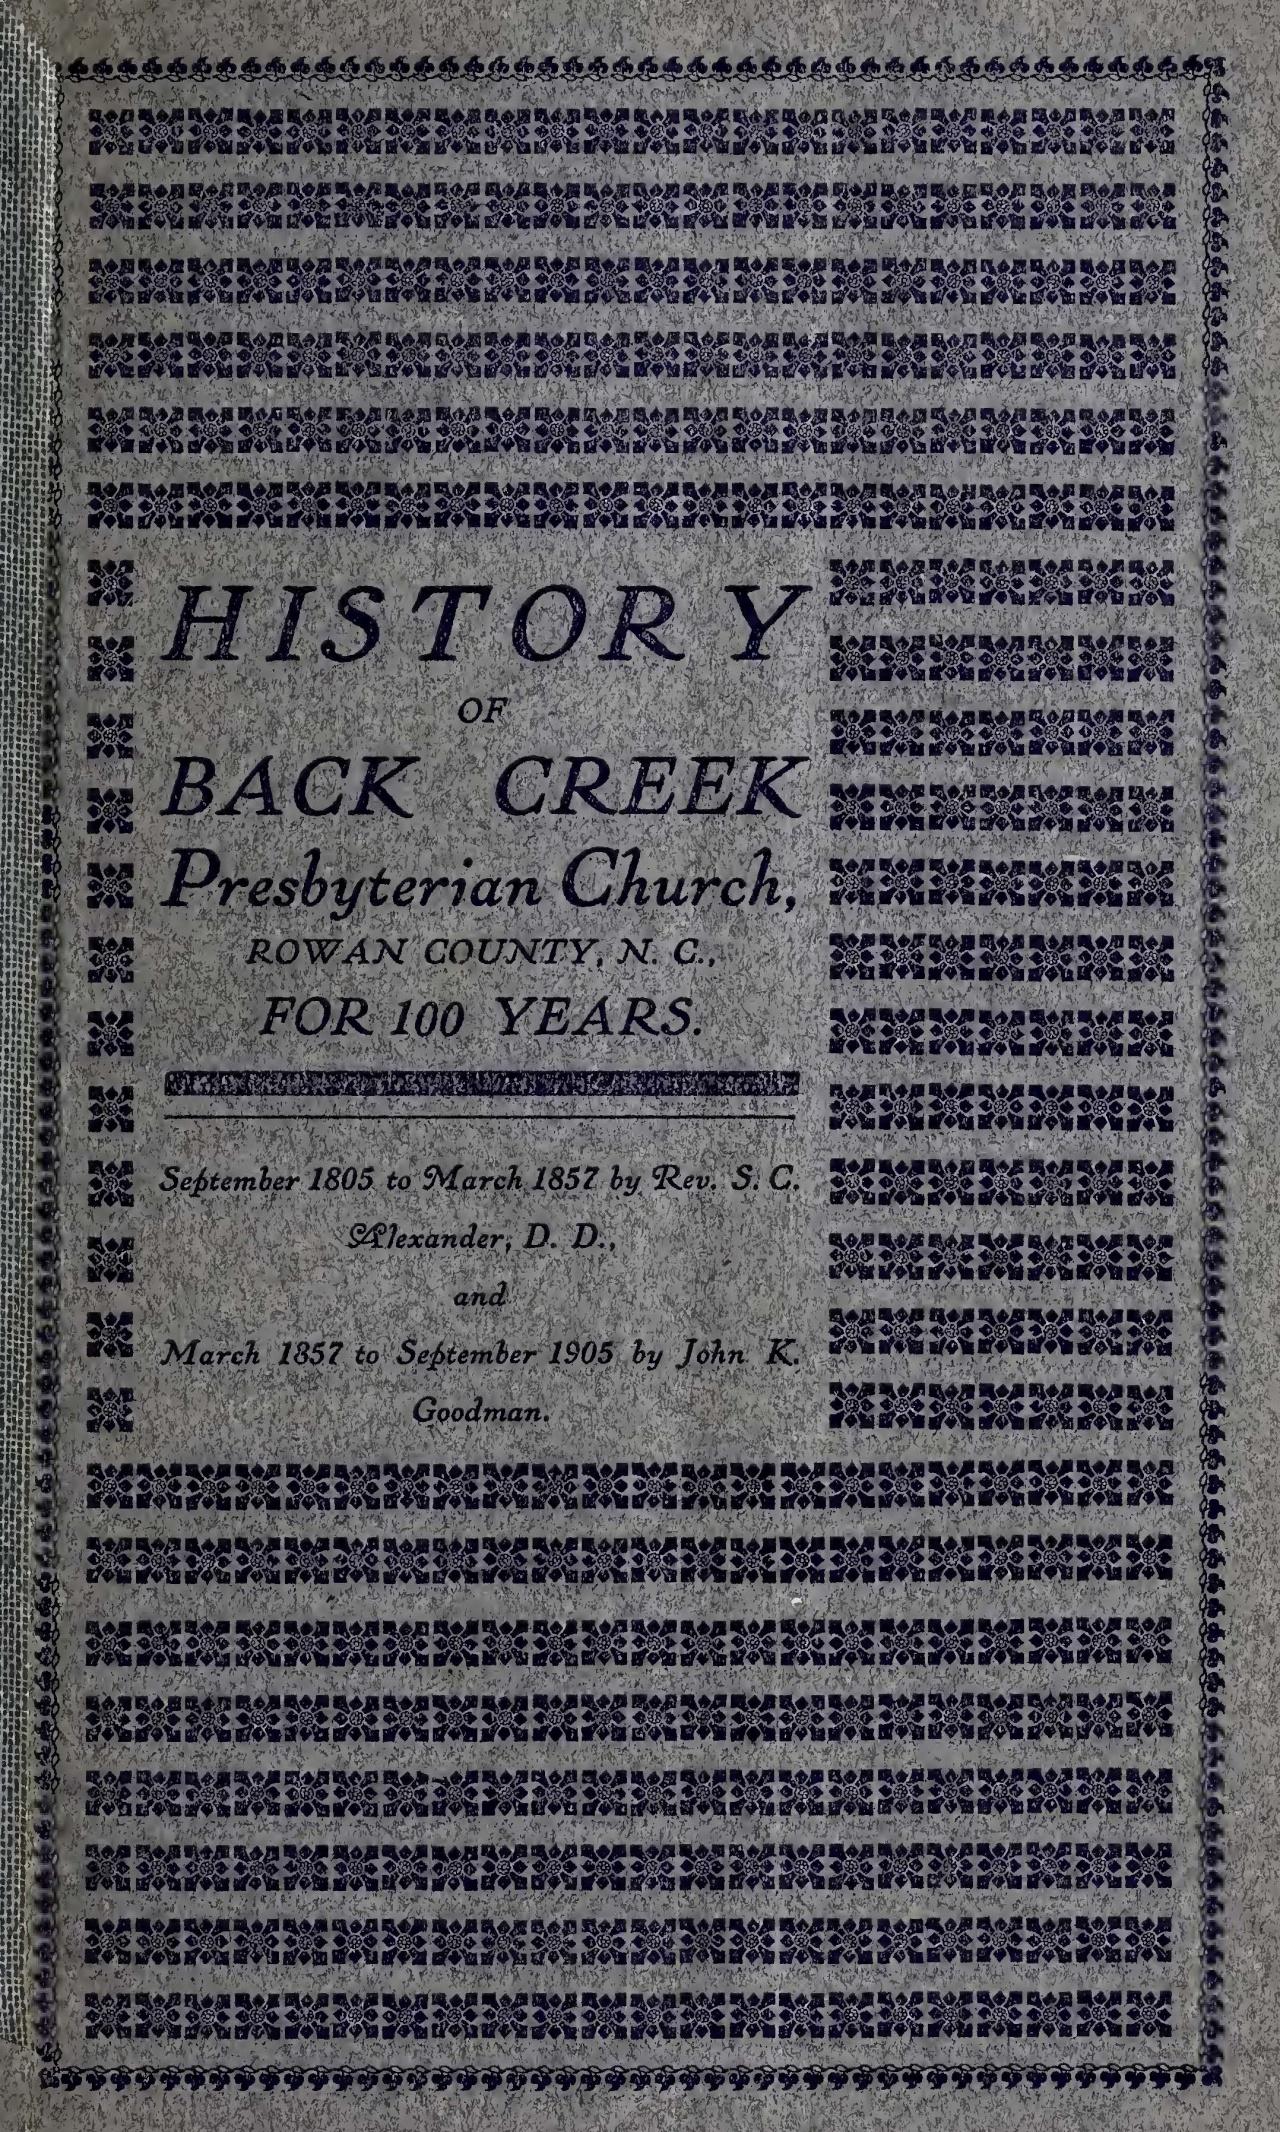 Alexander, Sr., Samuel Caldwell, History of Back Creek Presbyterian Church Title Page.jpg